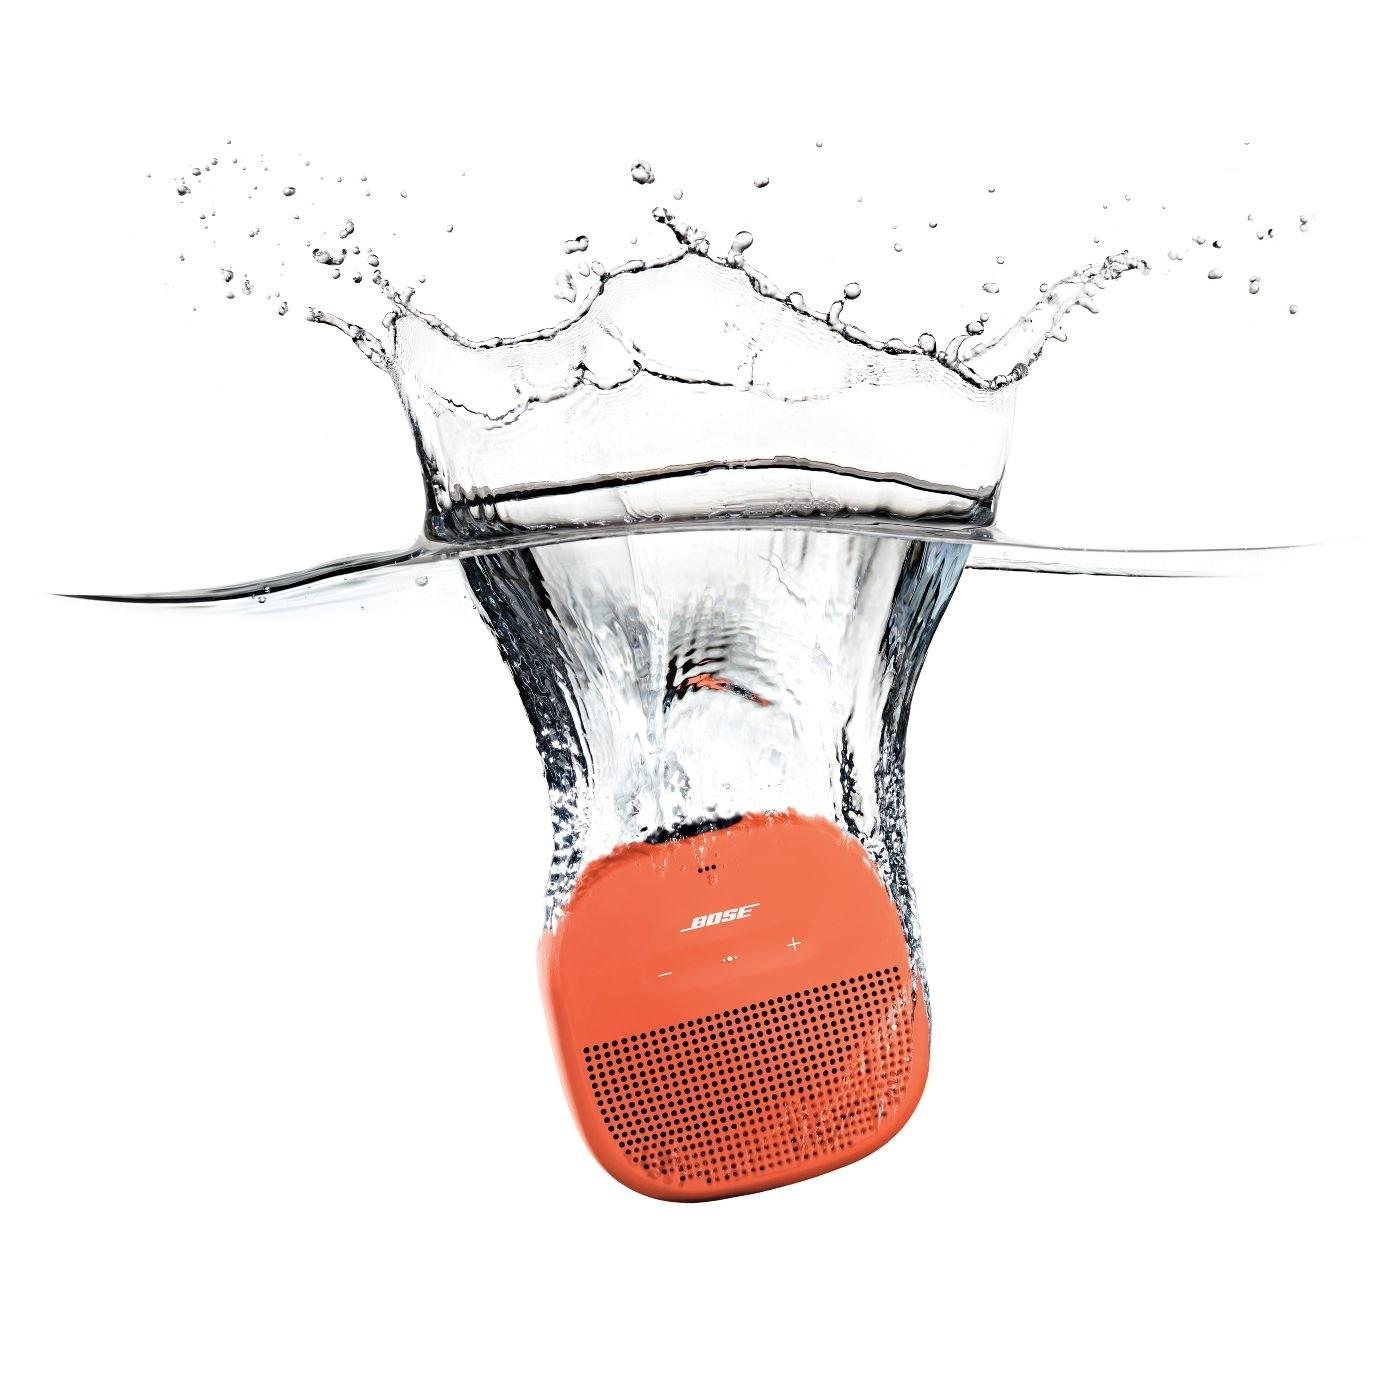 The speaker, shown in orange and submerged underwater